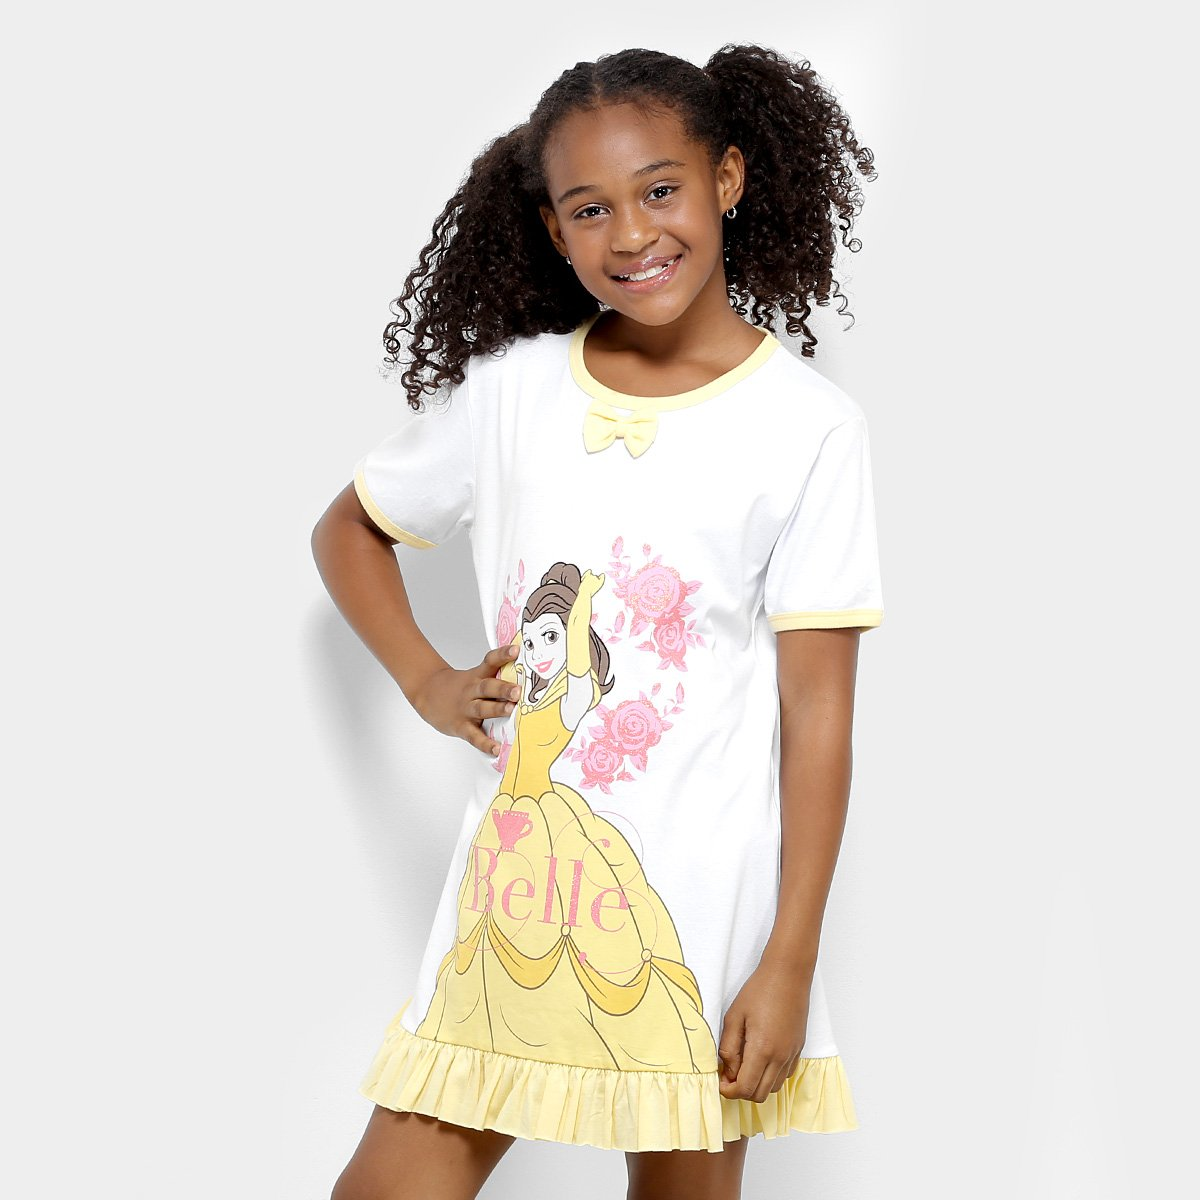 Camisola Feminina Infantil Lupo Camisola Infantil e Branco Amarelo Bela Princesas YYrqa